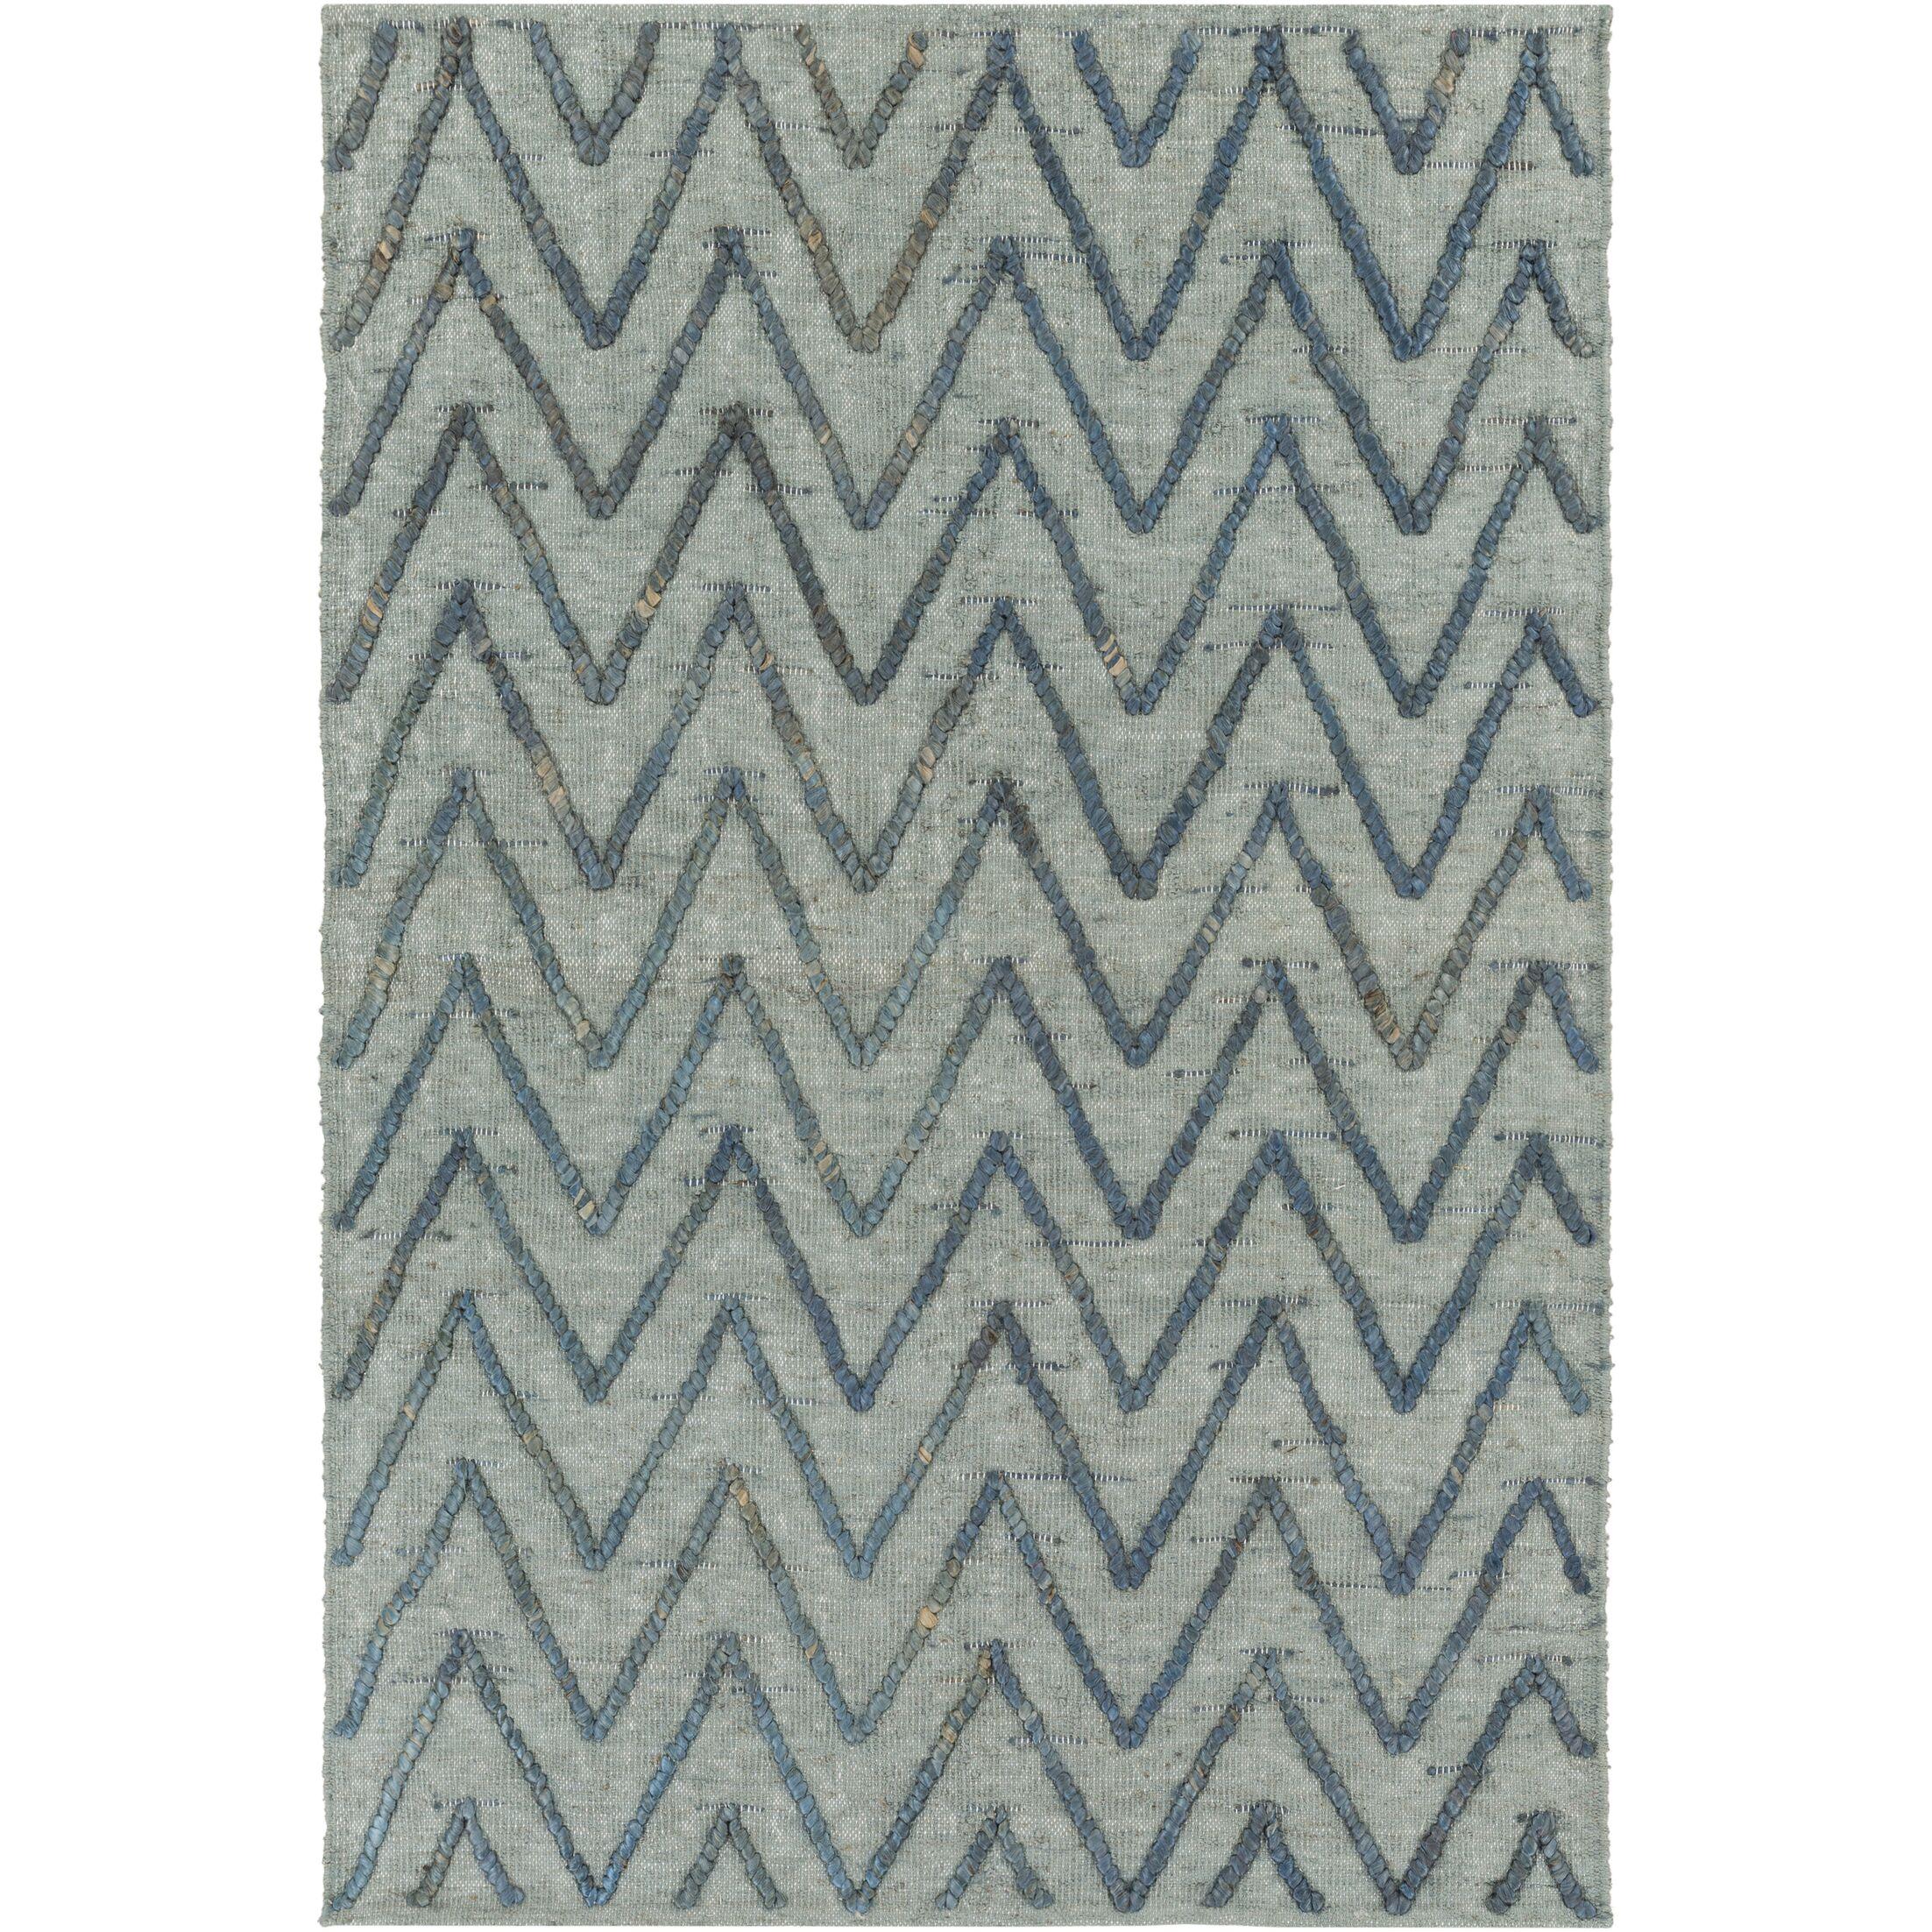 Rachelle Hand-Woven Teal/Bright Blue Area Rug Rug Size: Runner 2'6